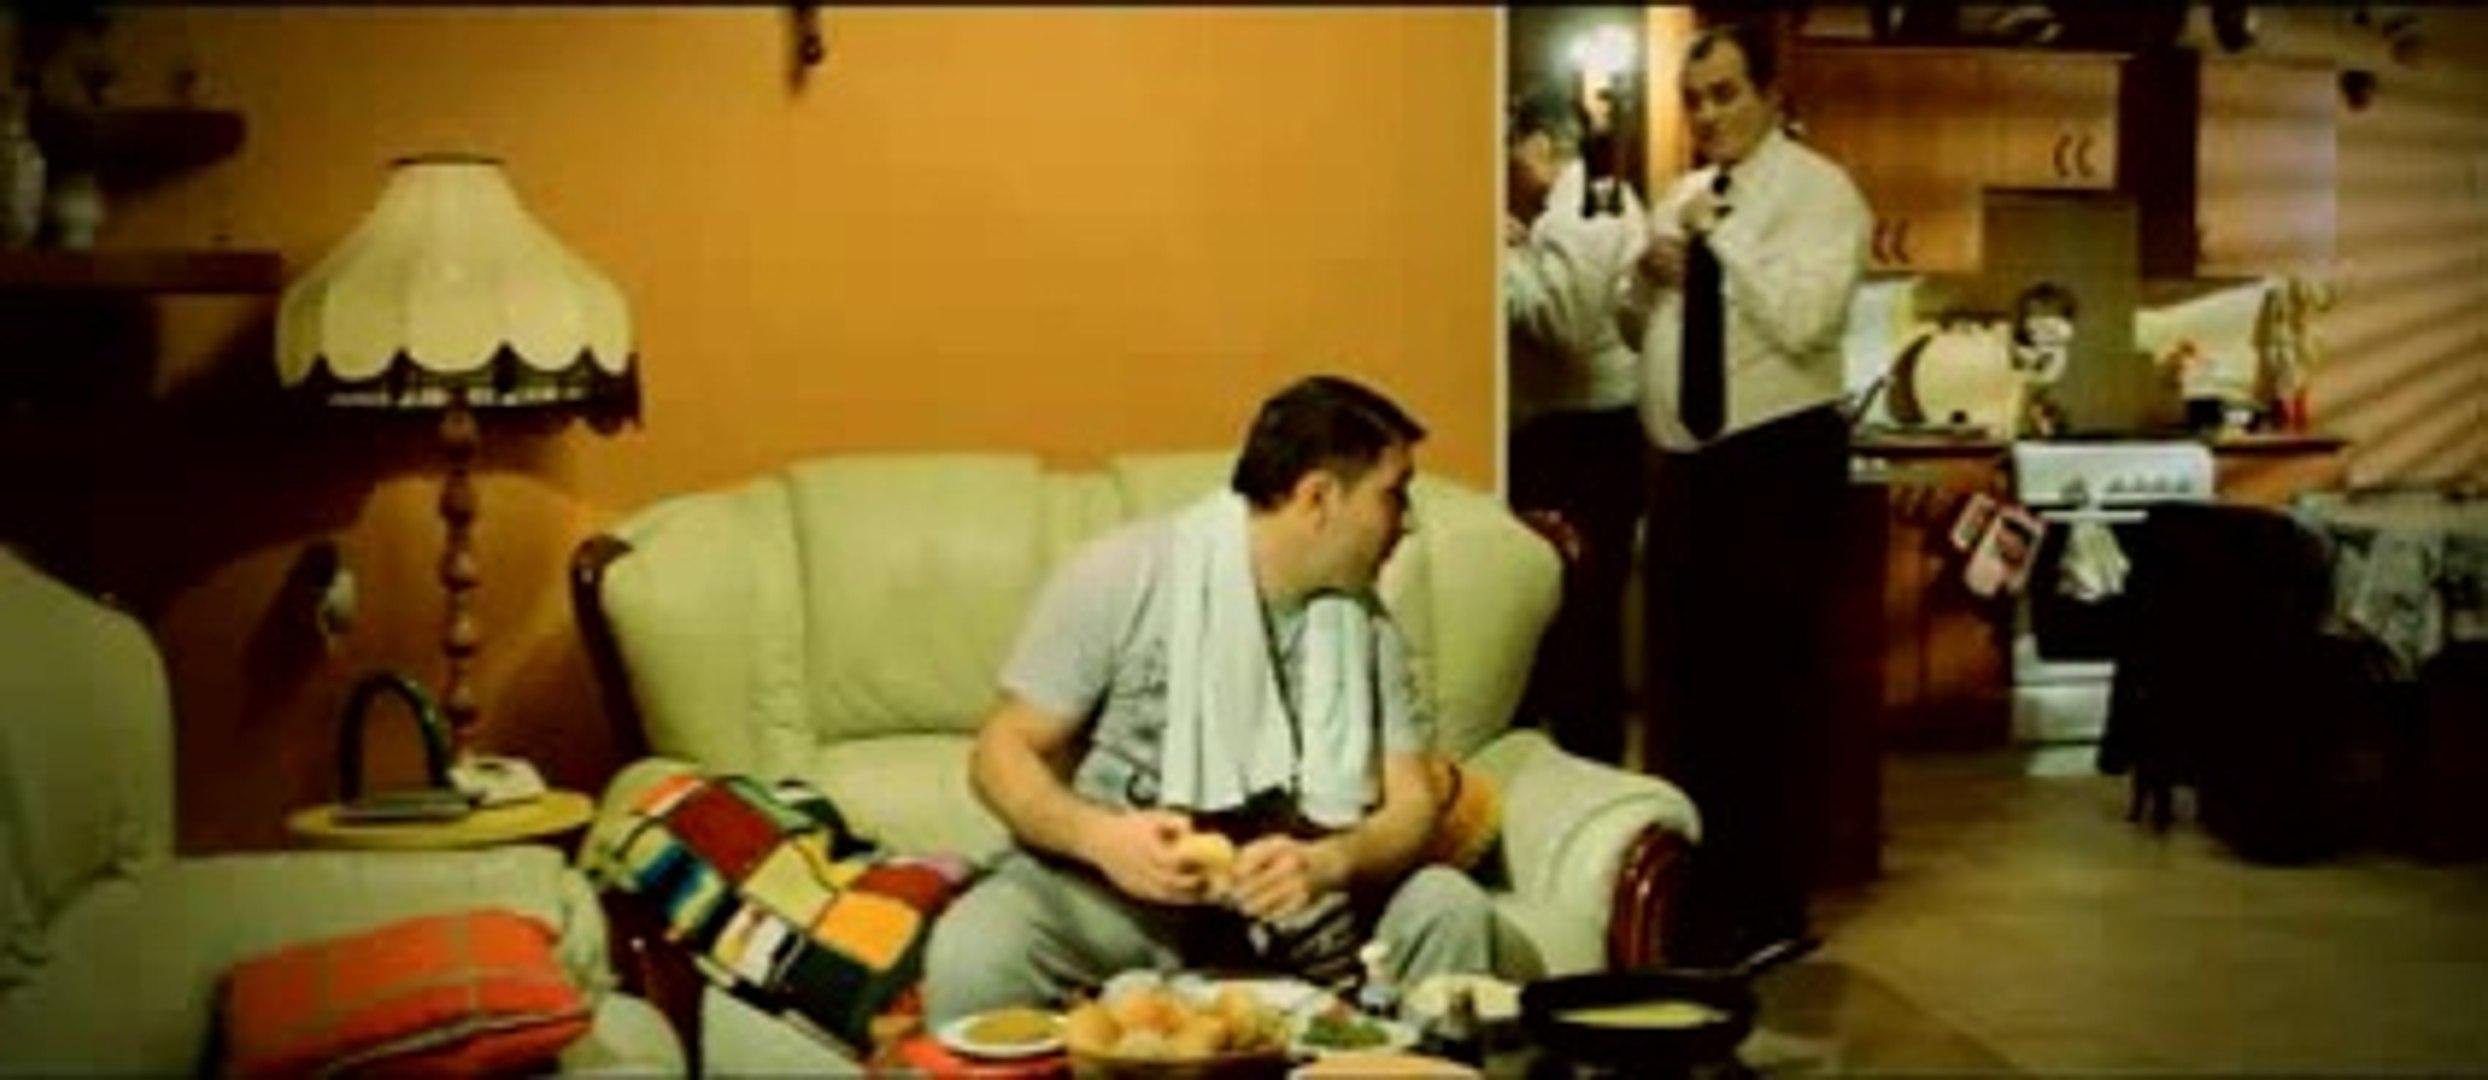 Смотреть онлайн армянский сериал Xaghic durs_1